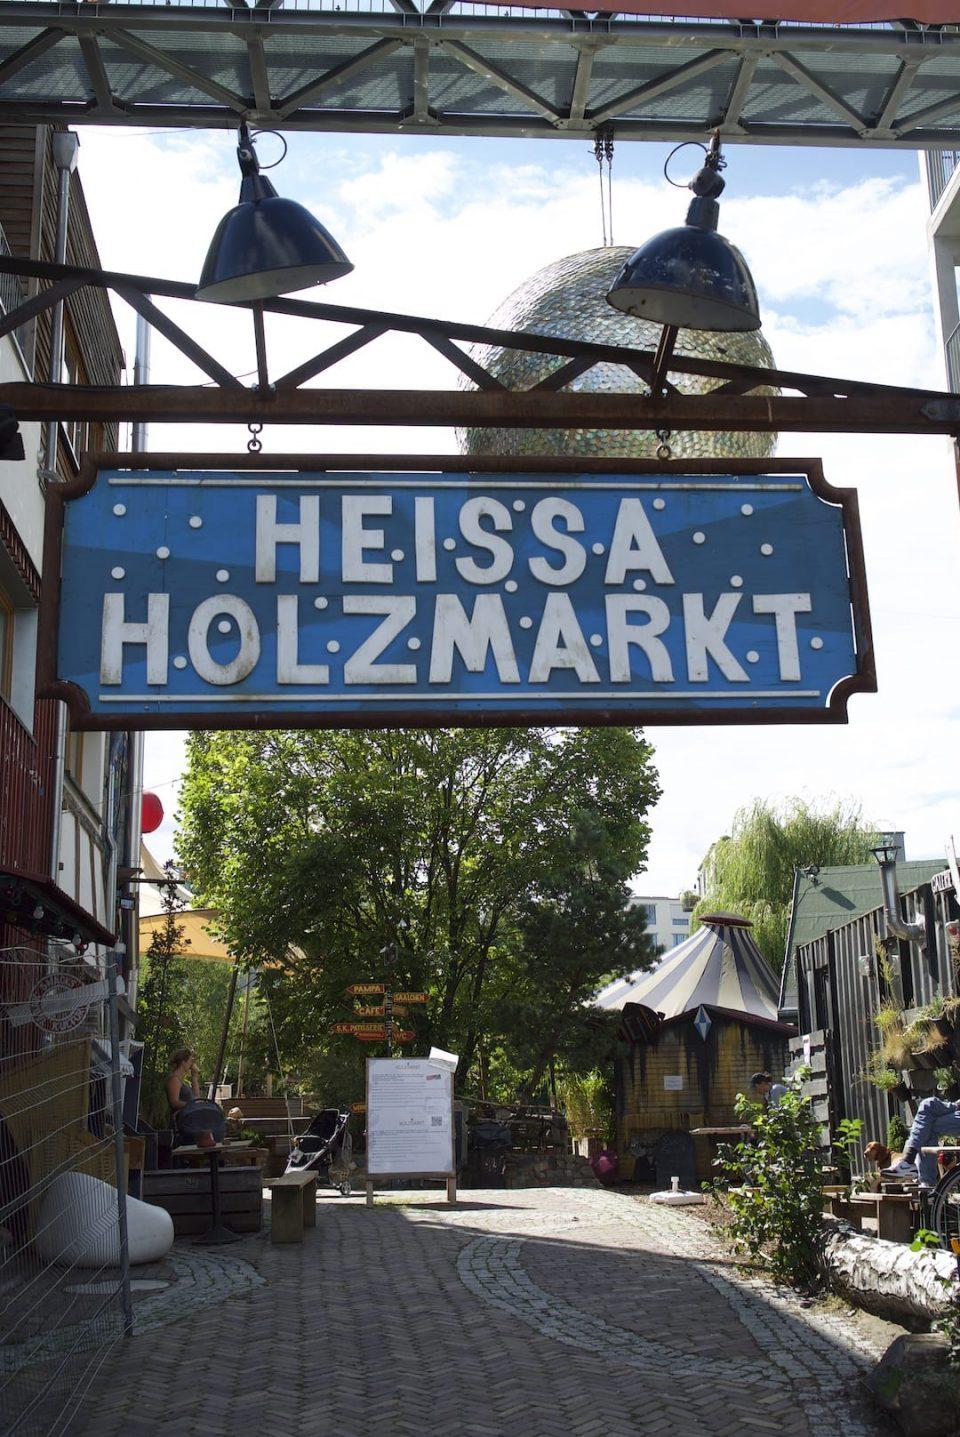 Holzmarkt, Location First Steps 2020